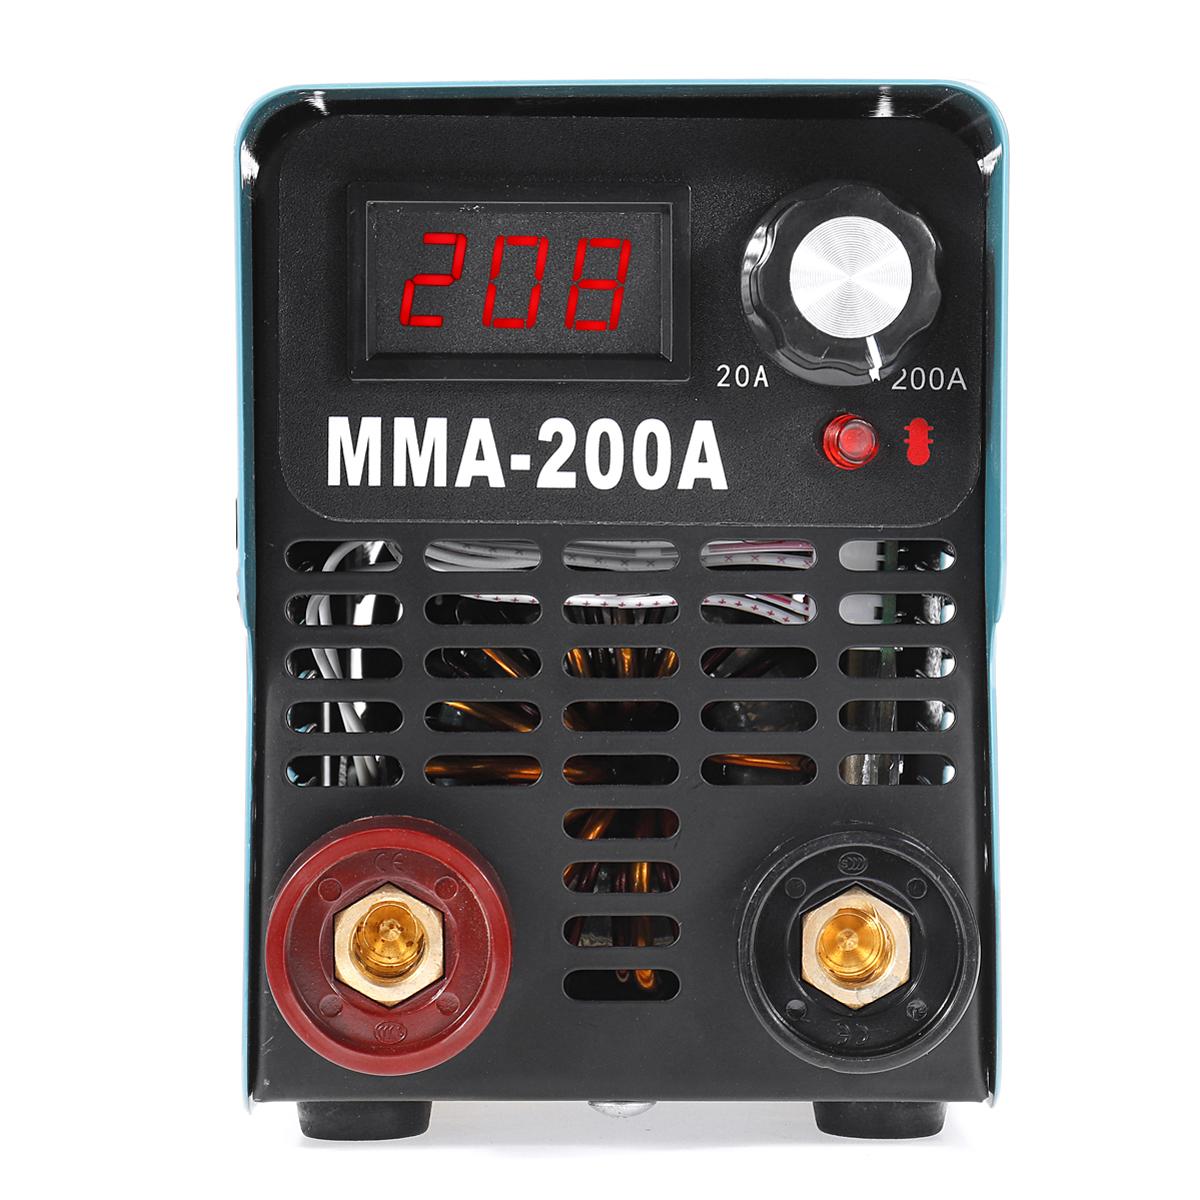 ZX7/MMA/ARC-200 4000W IGBT 220V Mini Welder ARC Welding Machine LED Display Hand Hold Inverter